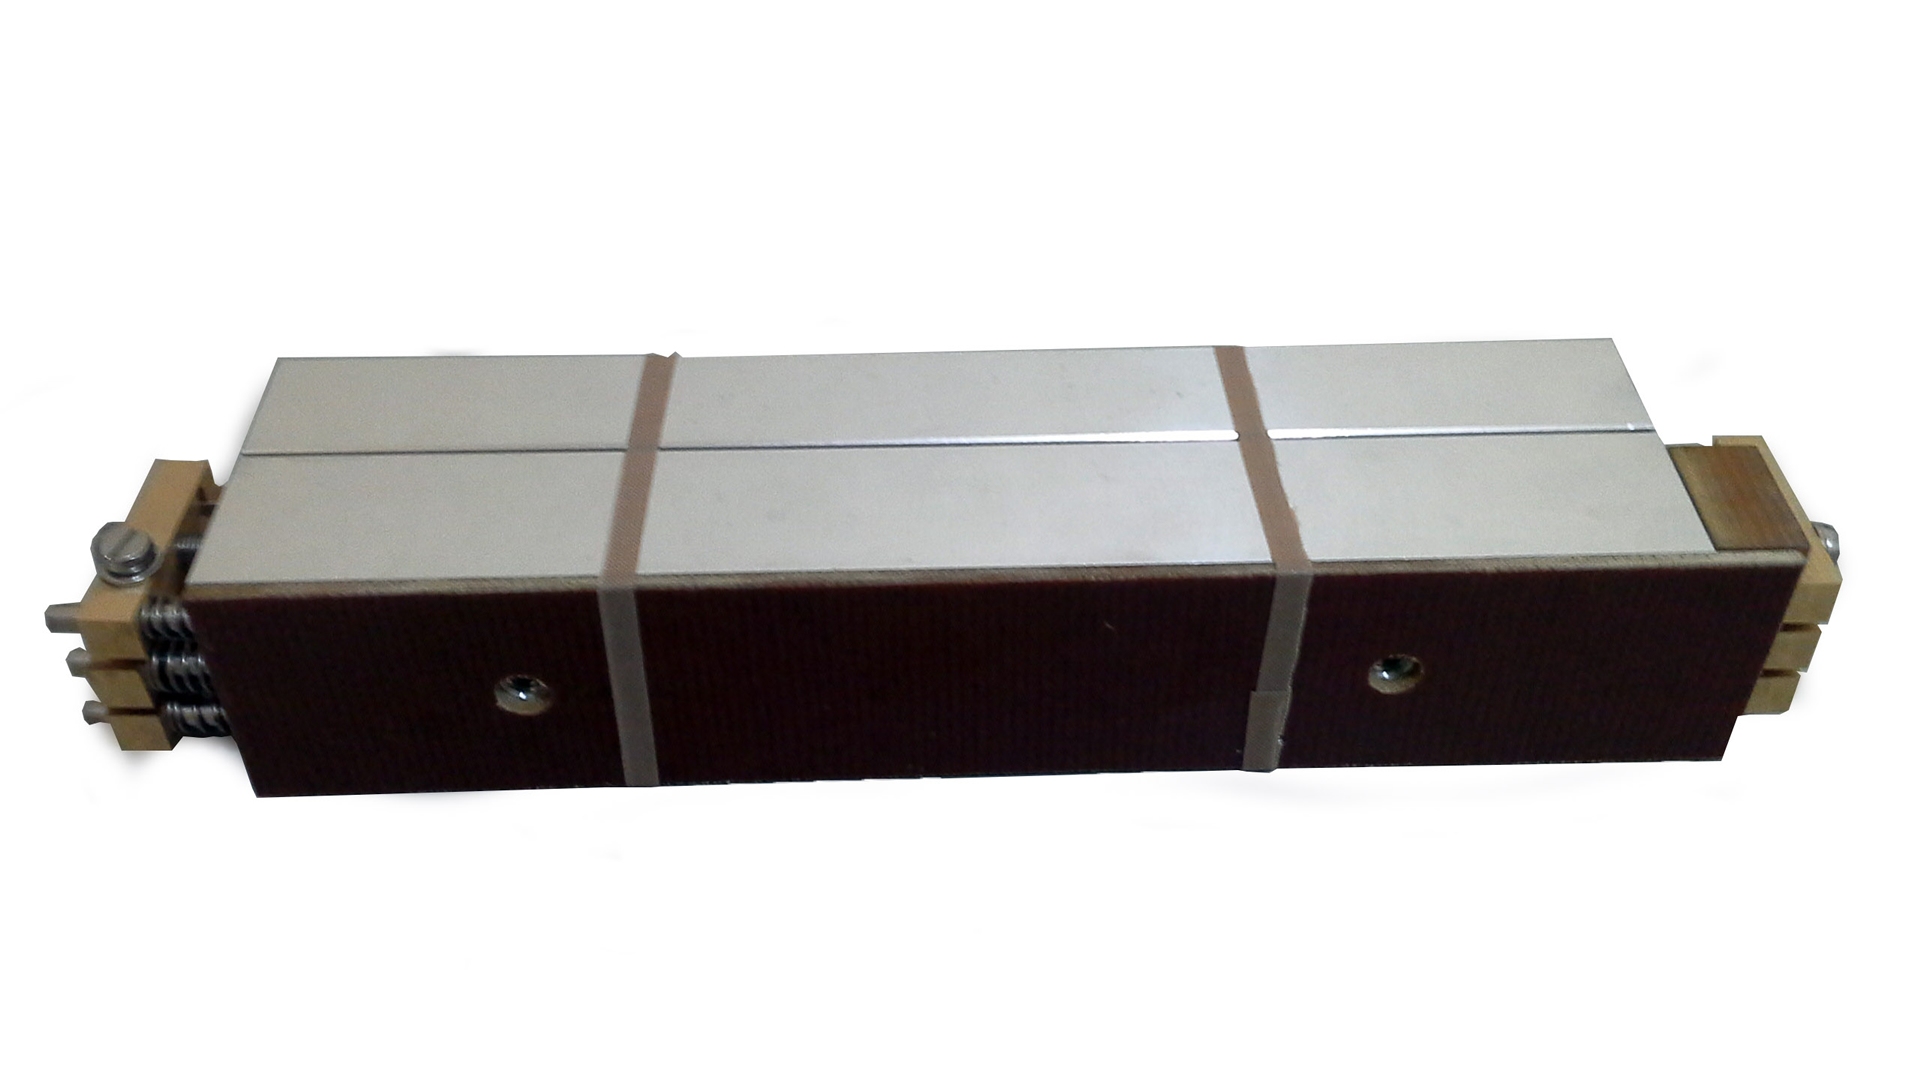 Mordaças embaladoras - Mordazas empacadoras 2